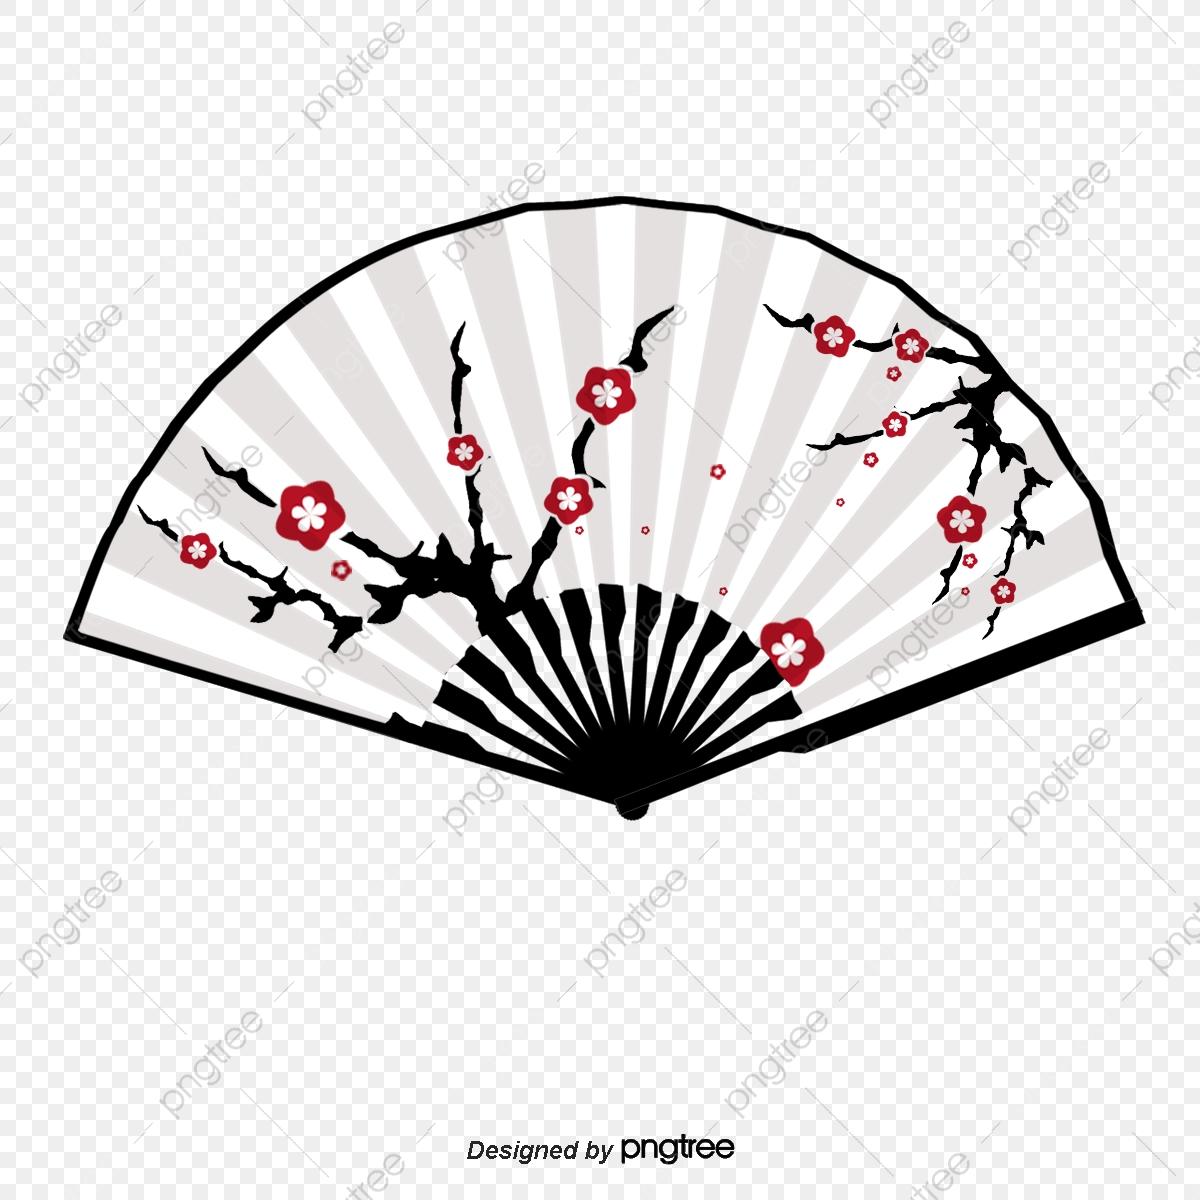 Fan clipart japanese style, Fan japanese style Transparent.